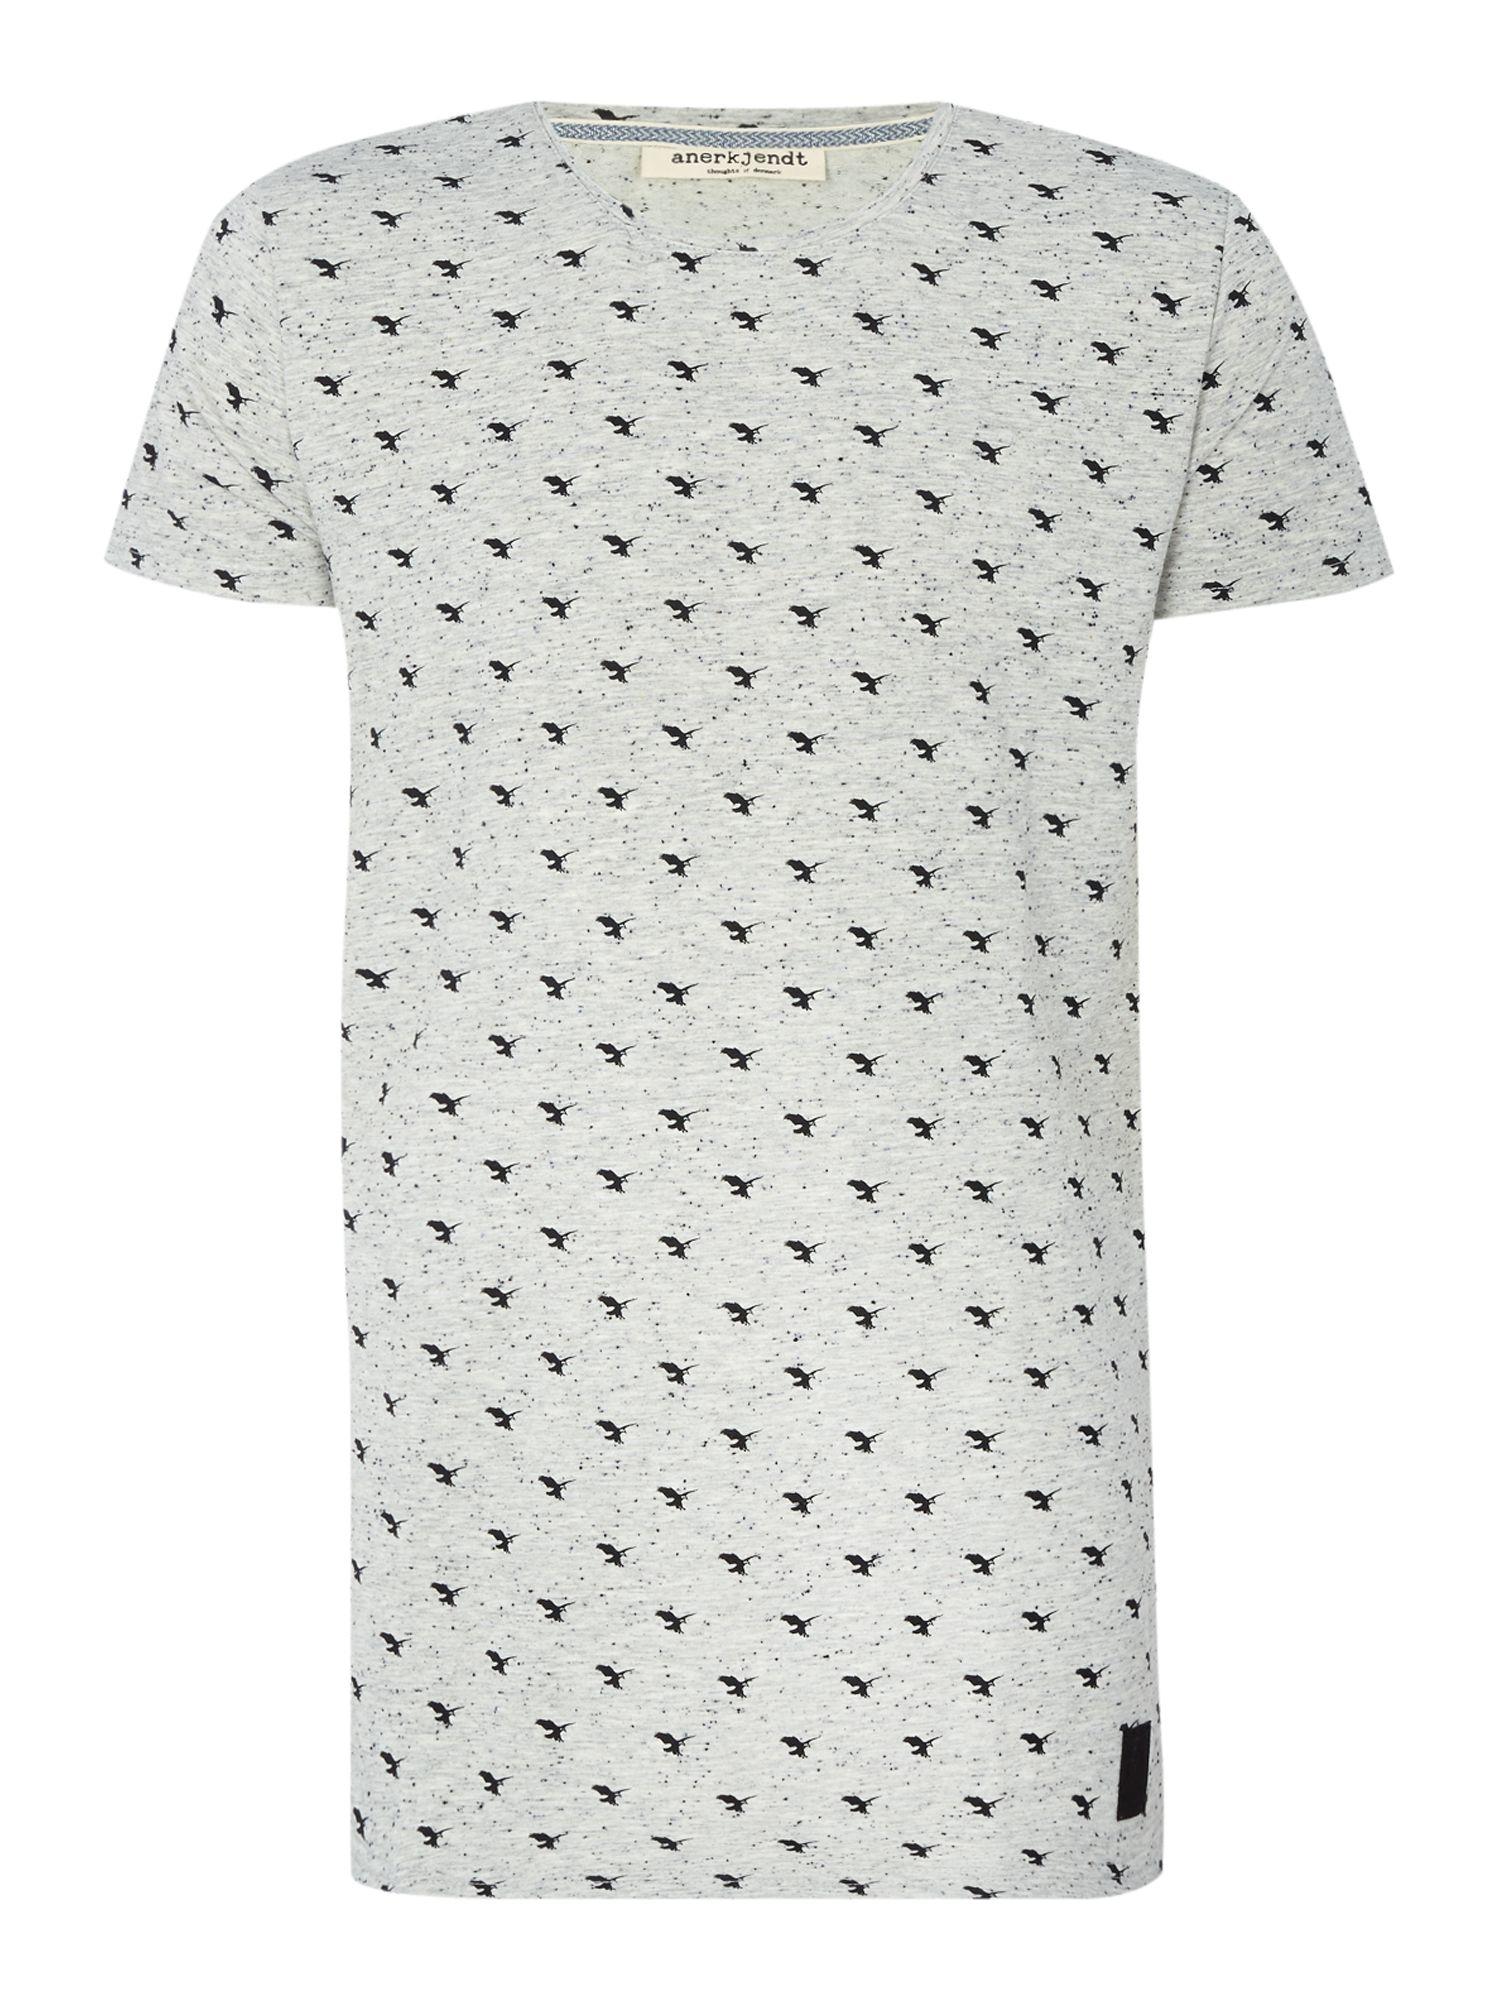 Lyst anerkjendt regular fit all over hawk print t shirt for All over print t shirt